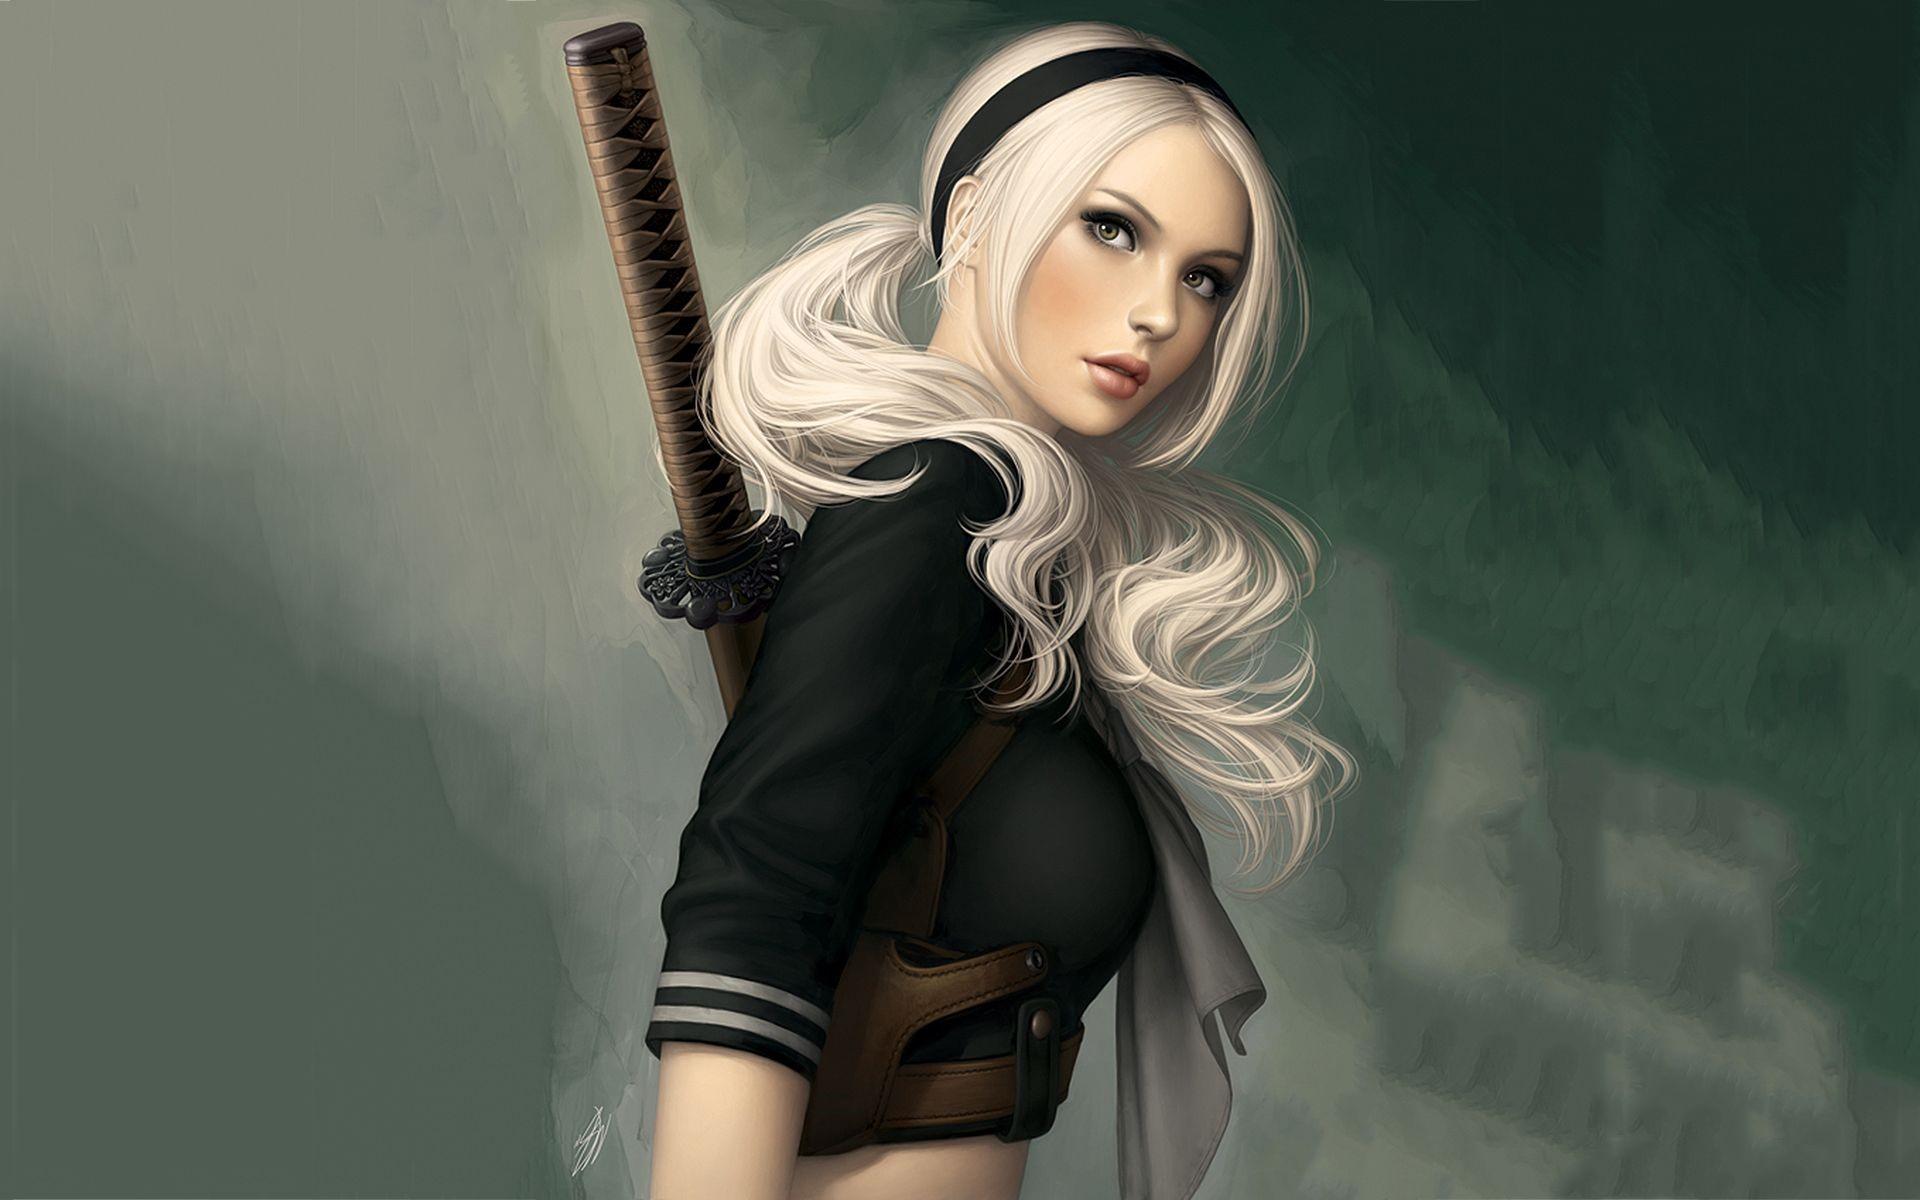 Japanese Samurai Girl images